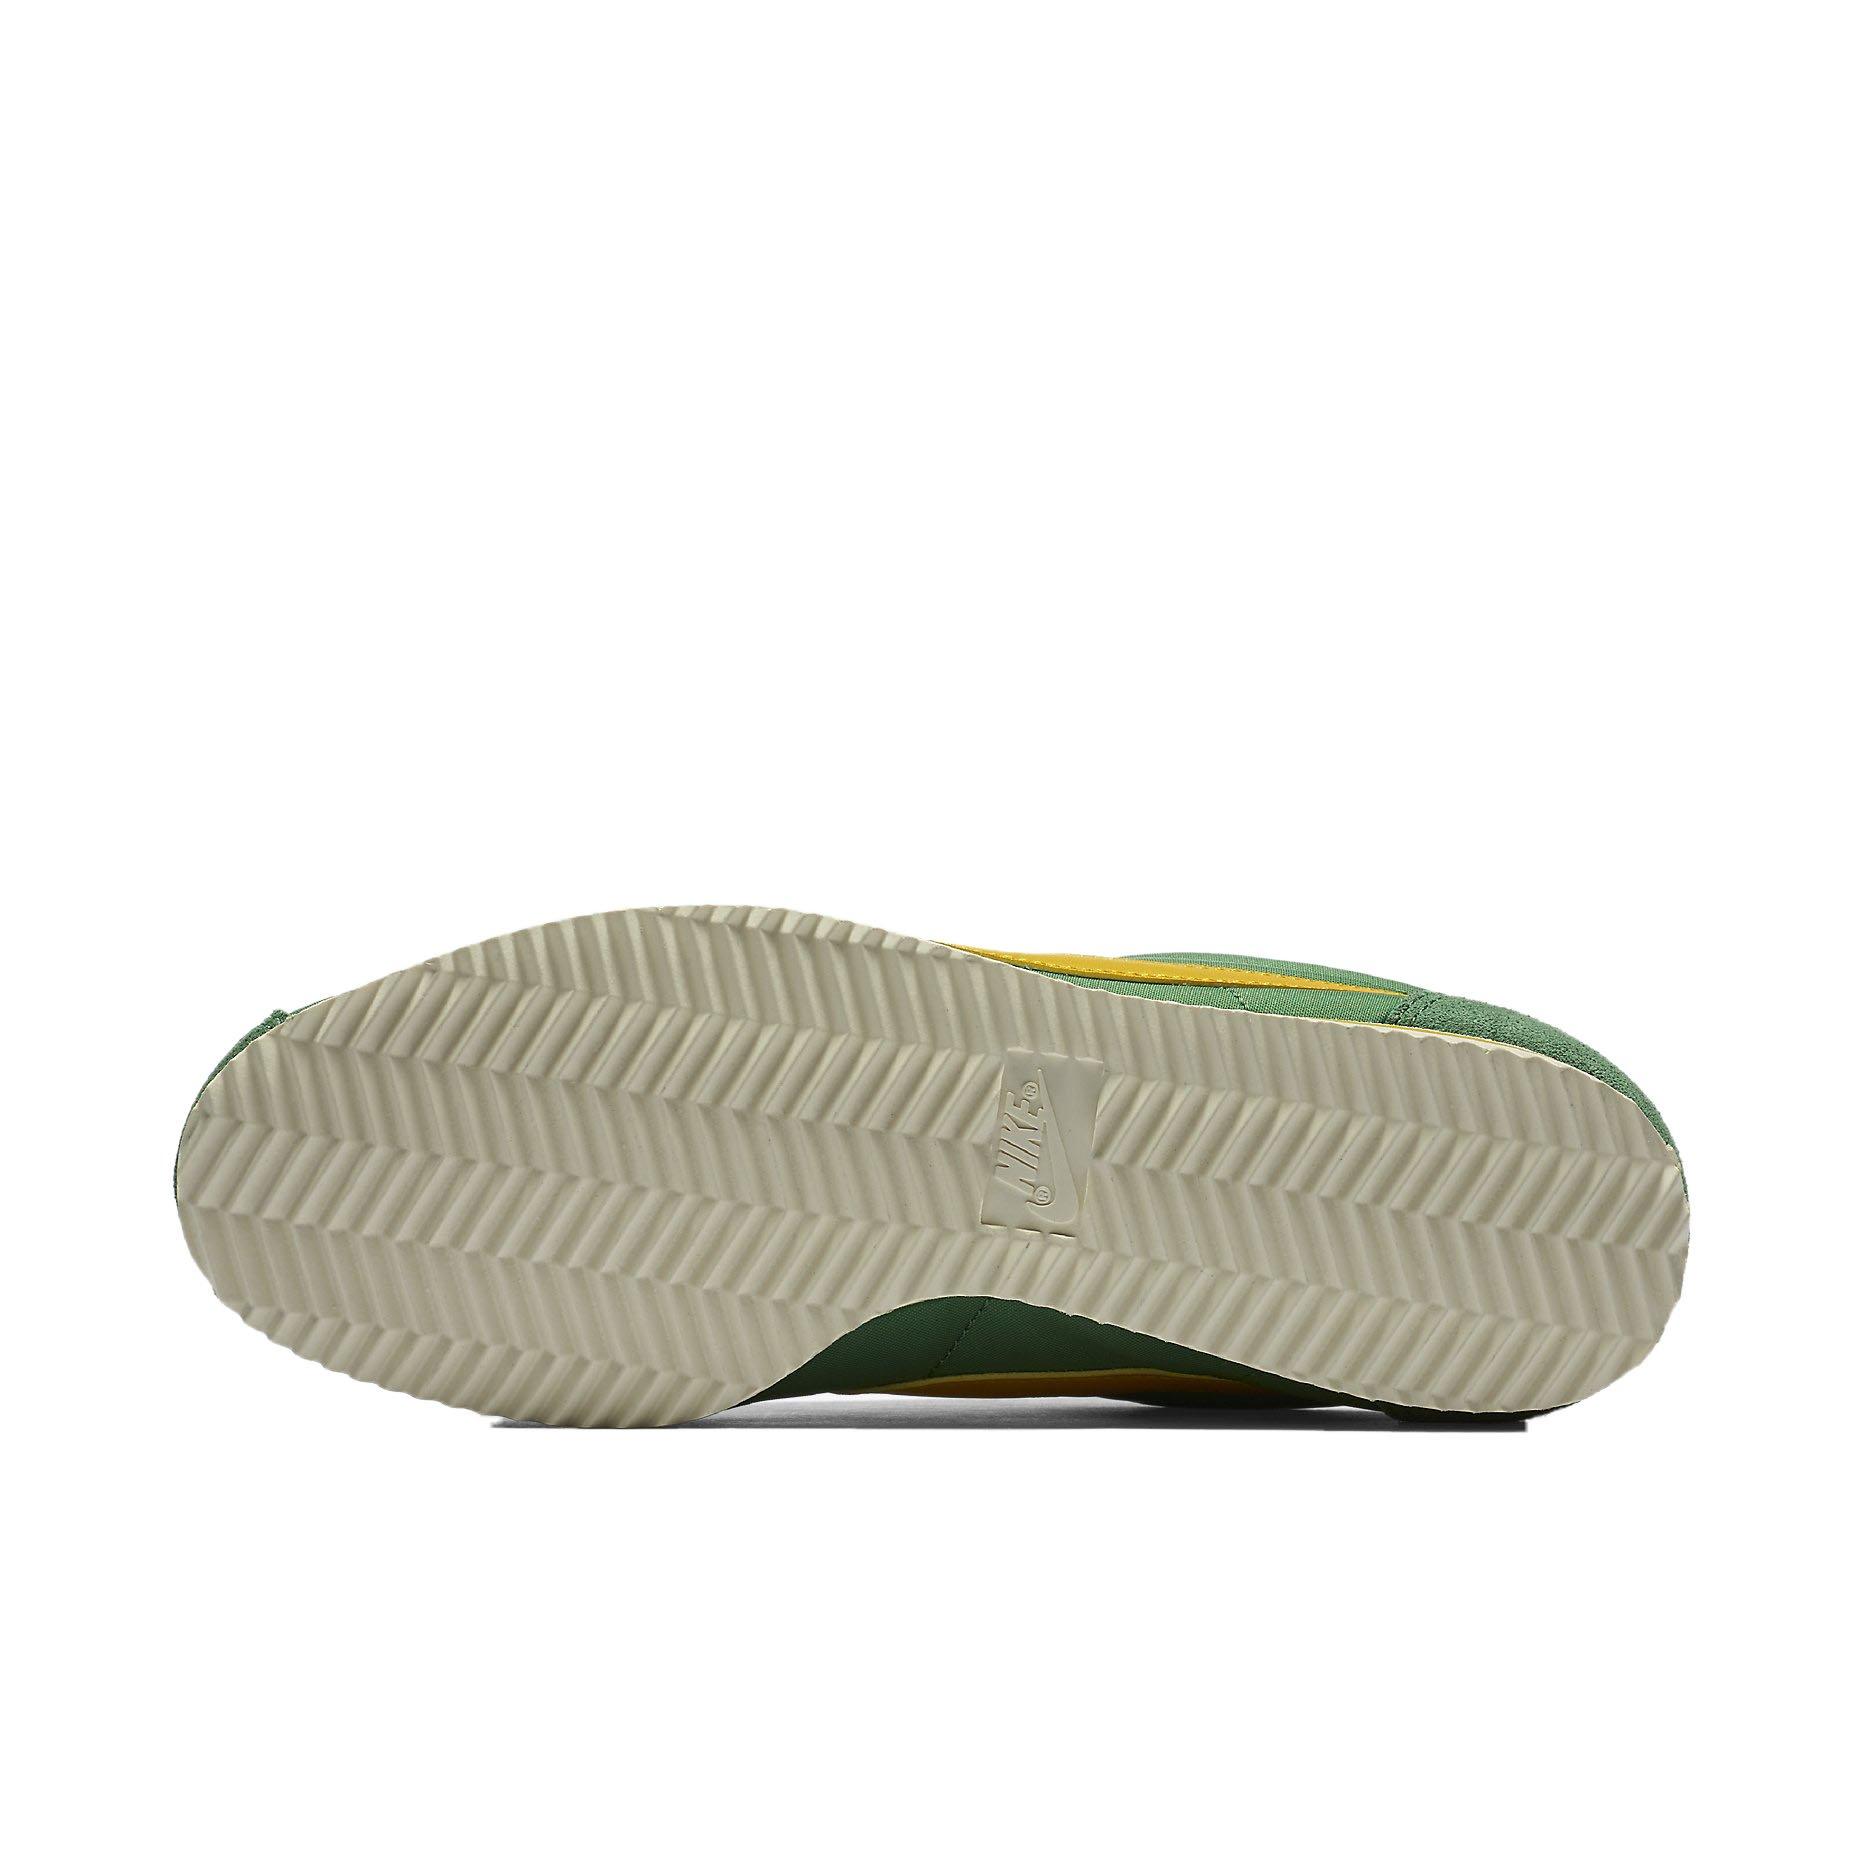 Nike Classic Cortez Nylon Prem Womens Style: 882258-301 Size: 8.5 M US